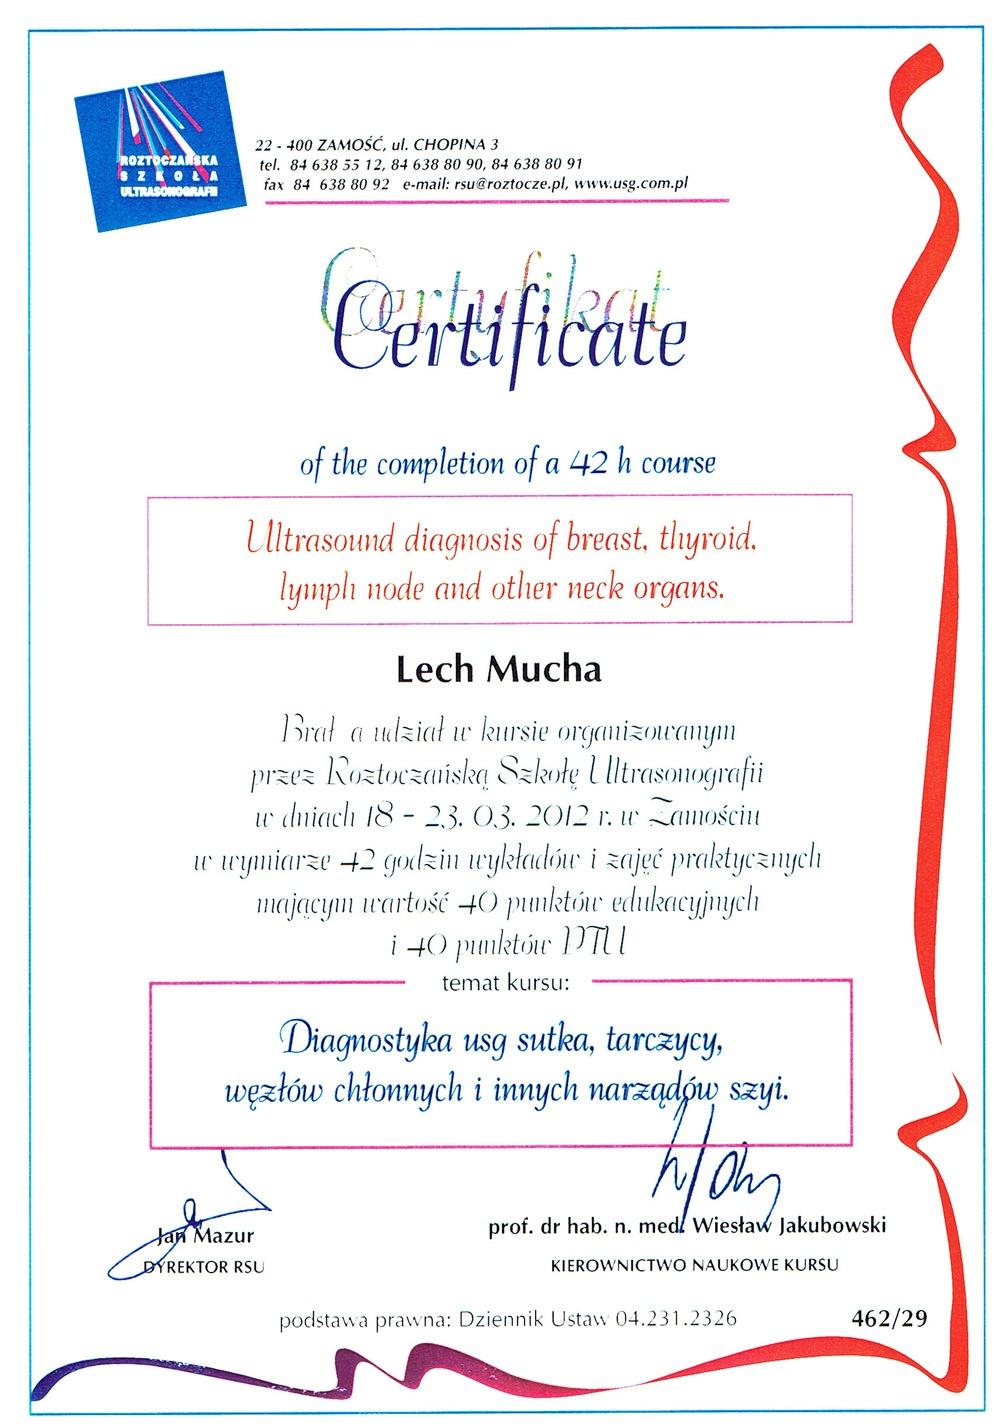 2012_03_18-23_lech_mucha_chiruria_zyl